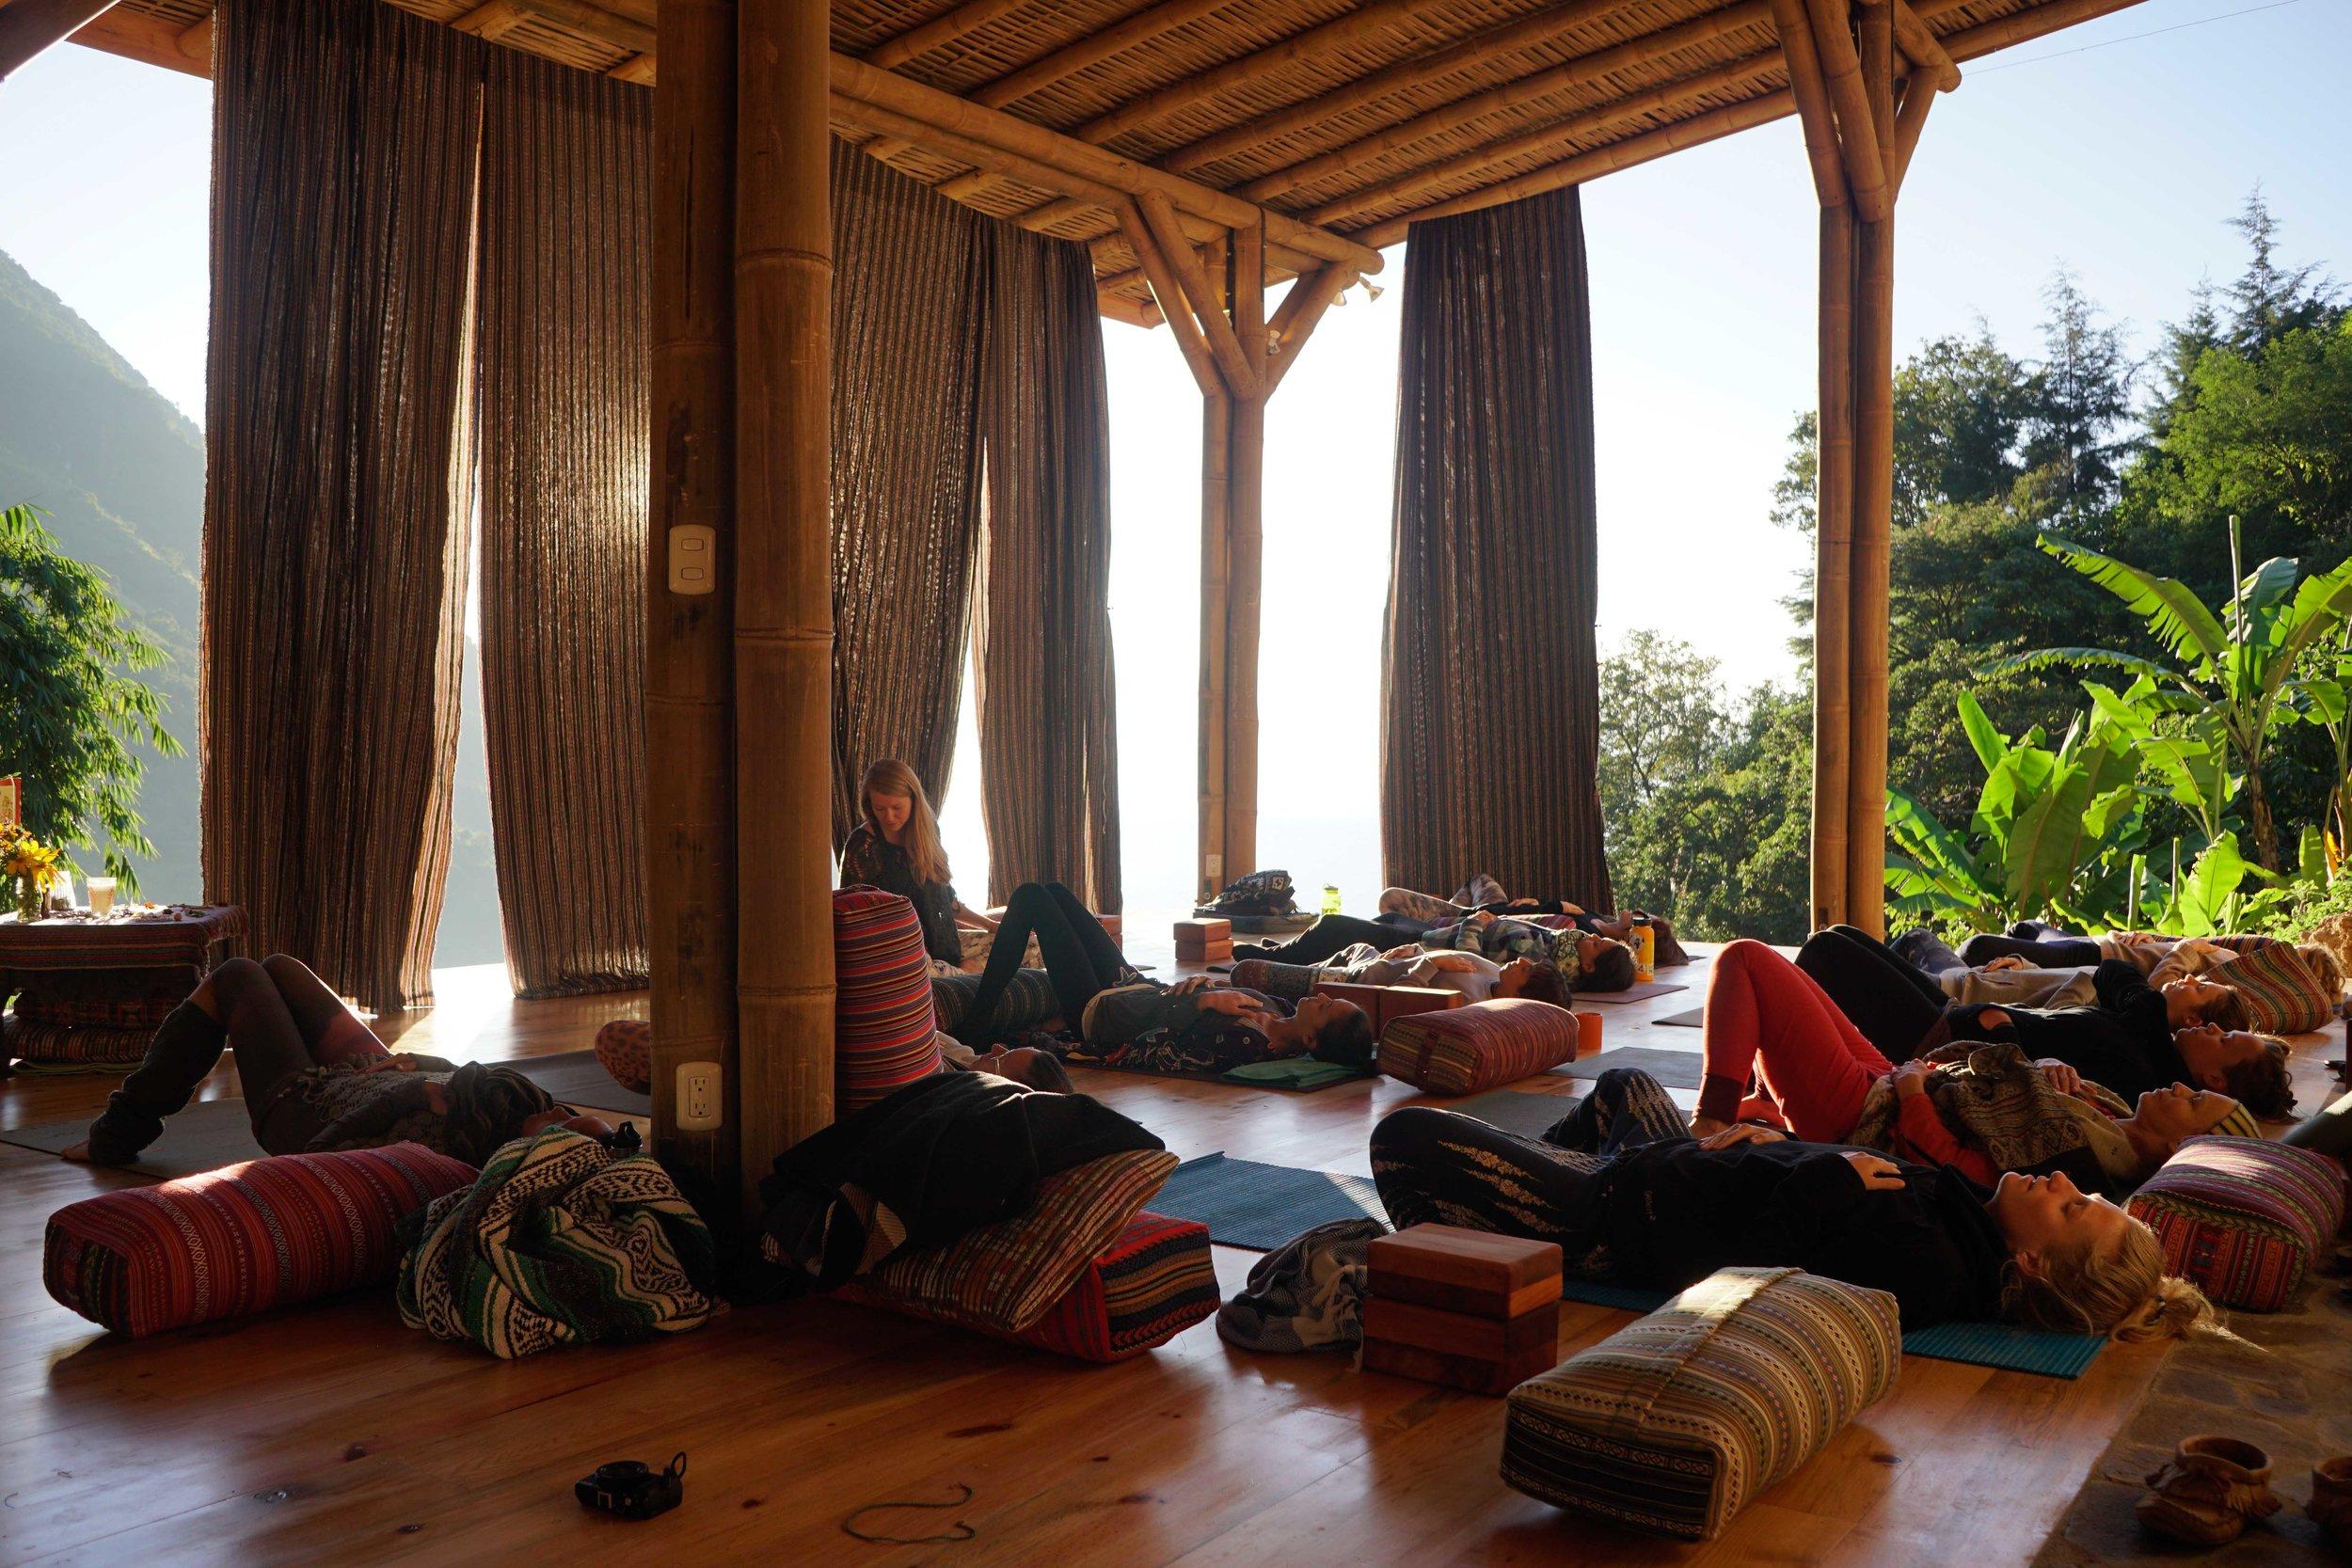 Yoga deck, yoga props, Bambu Guest House, Retreat Center, Small Group, Permaculture, Yoga, Organic, Regenerative Design, Regenerative Living, Tzununa, Lake Atitlan, Guatemala, Centra America, Natural Building